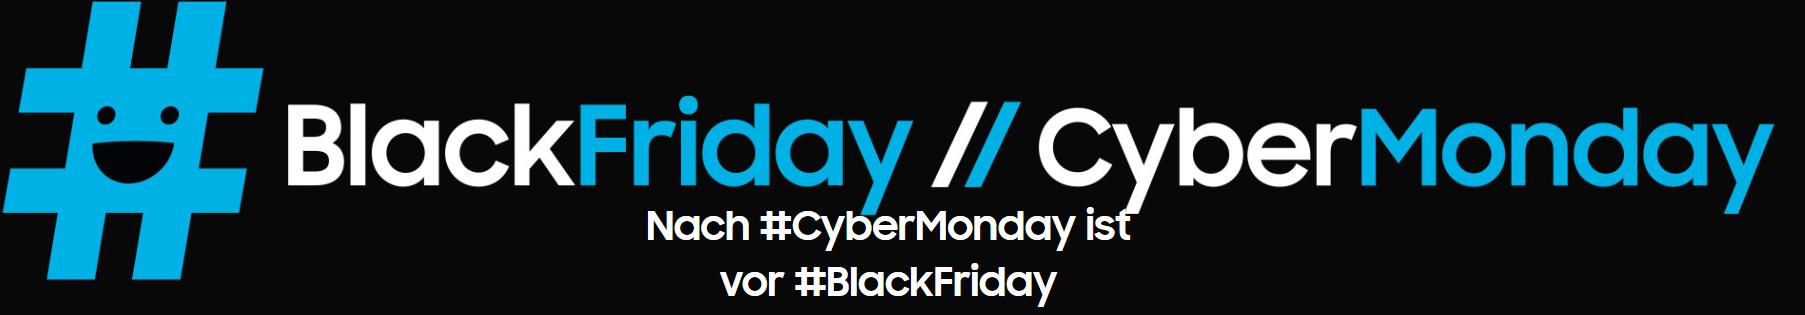 Samsung Black Friday Teaser